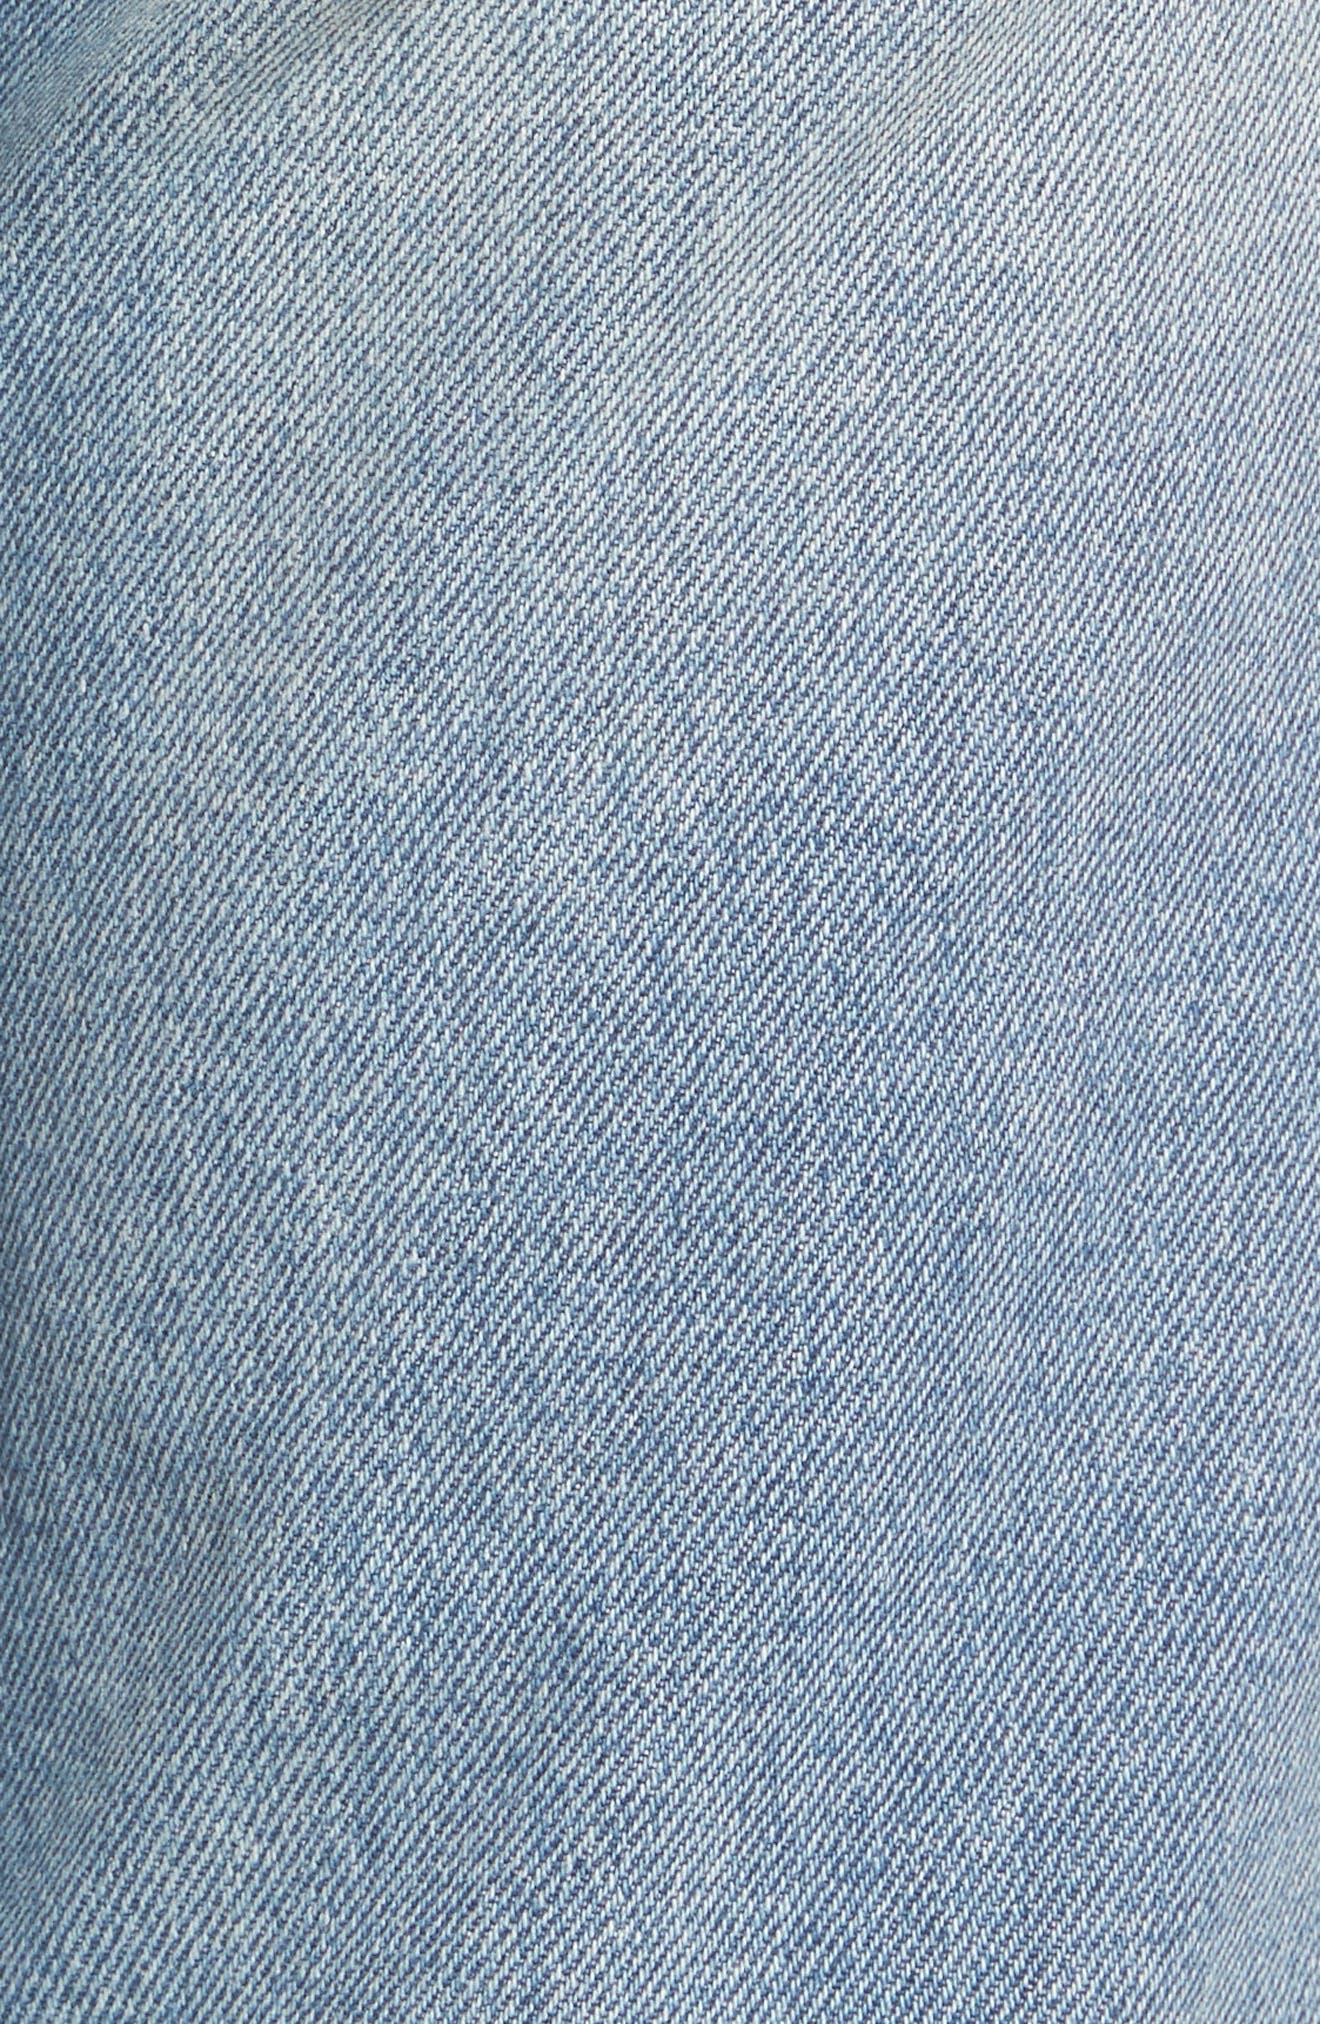 Sundays Straggler High Waist Jeans,                             Alternate thumbnail 5, color,                             400